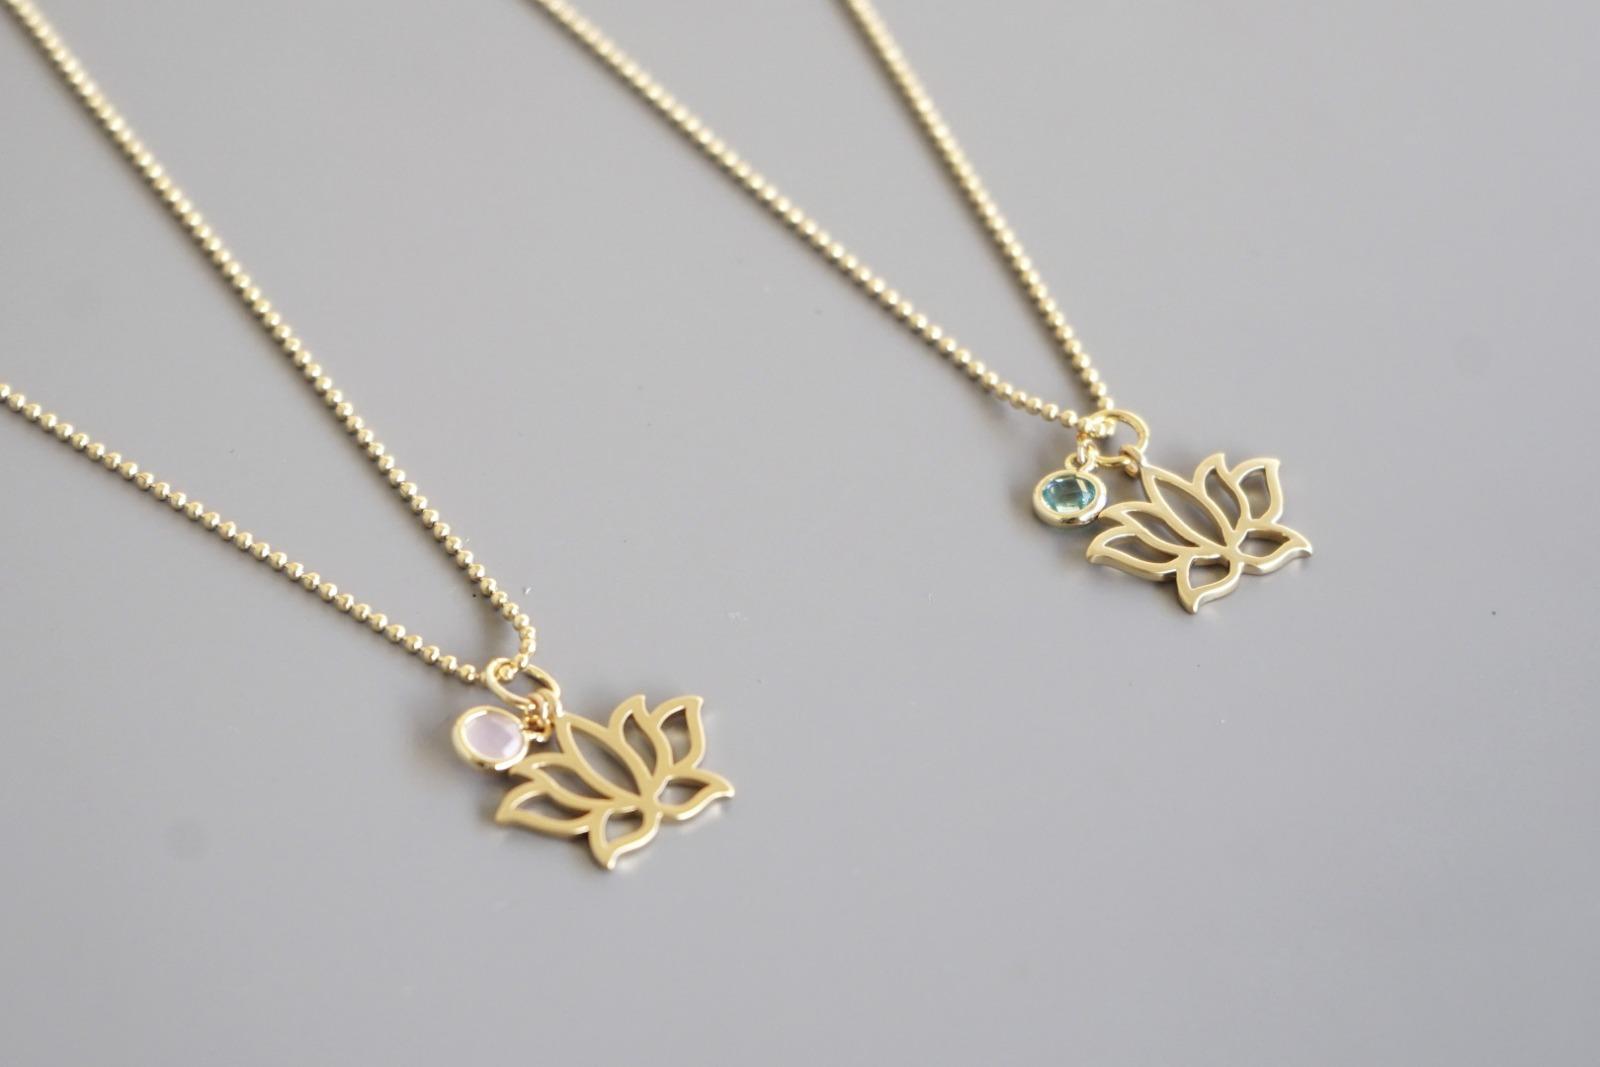 Kugelkette mit Lotusblüte und Kristall türkis